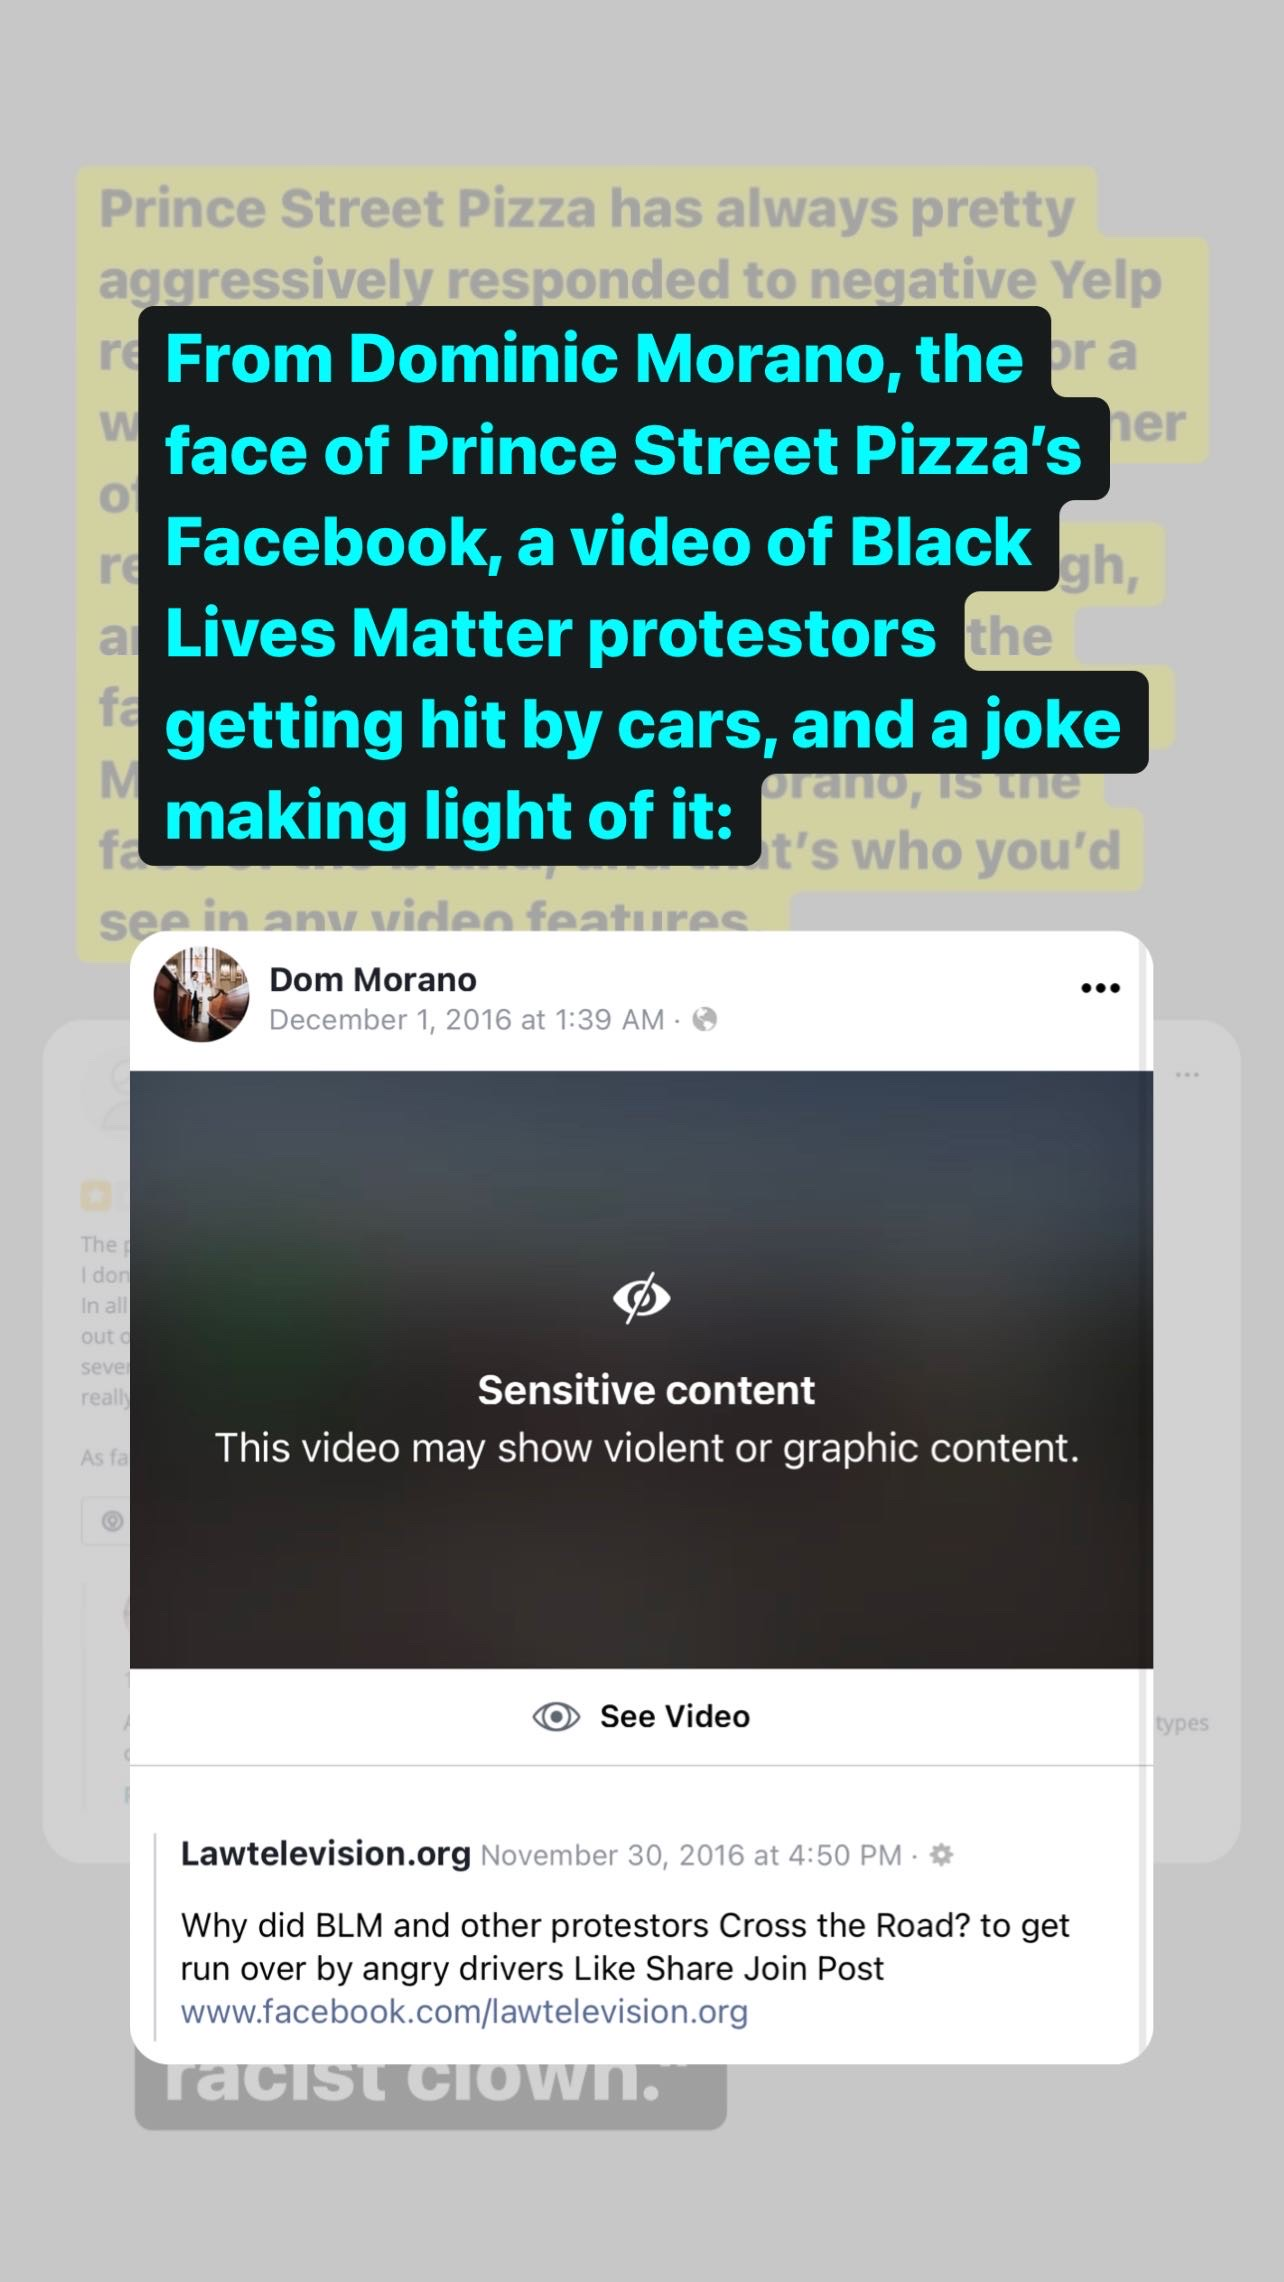 Joe Rosenthal (@joe_rosenthal) Instagram Story describing the Black Lives Matter protestor video reposted by Dominic Monaro. December 24, 2020.